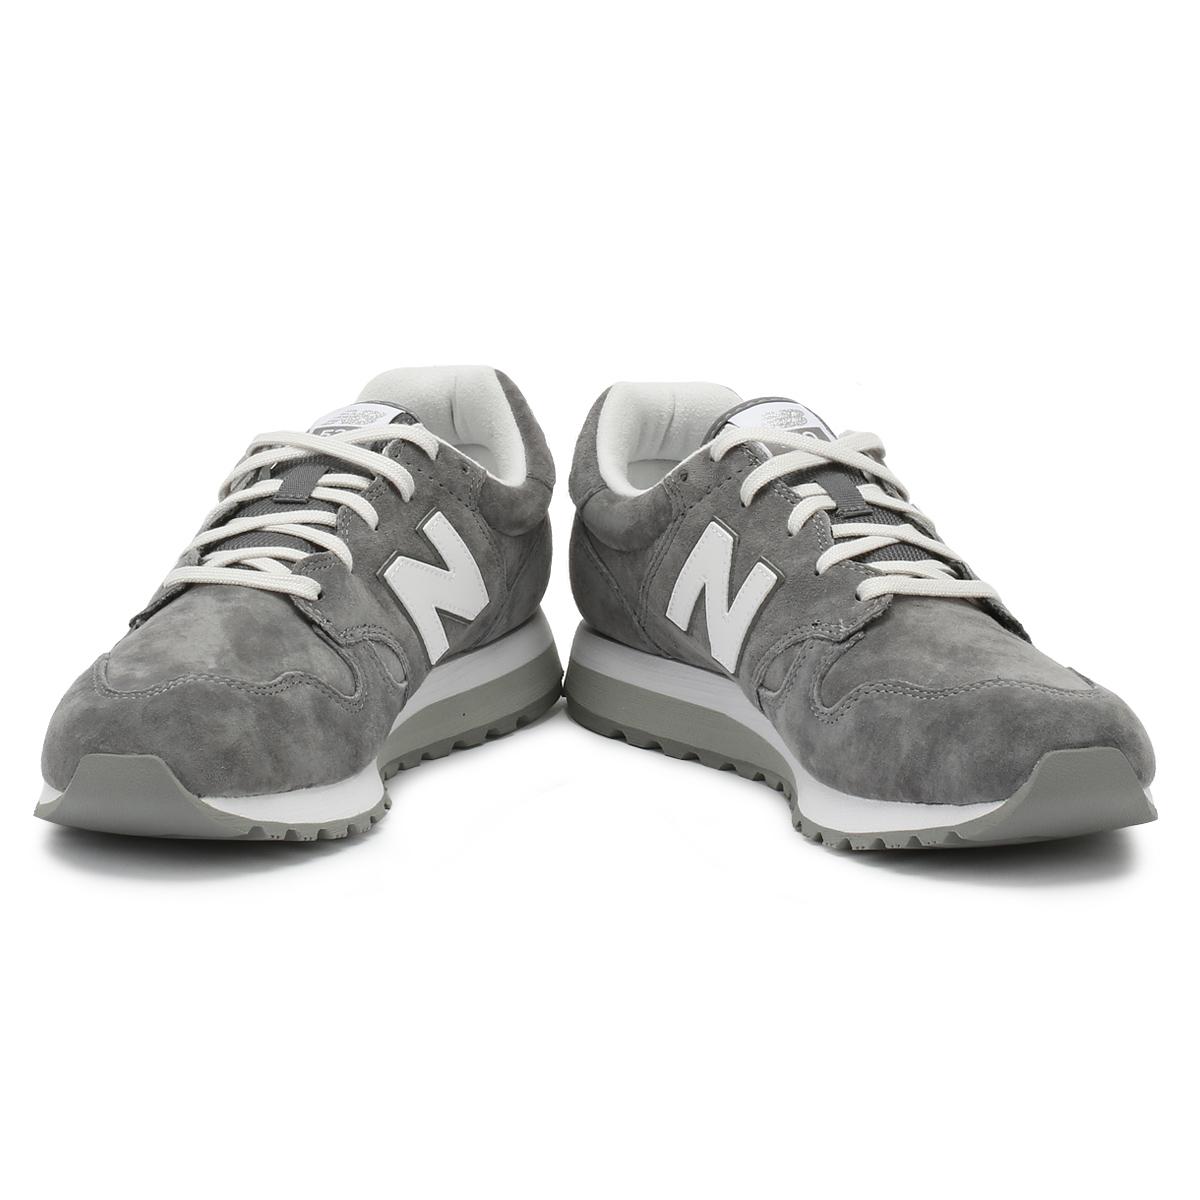 New Balance Damenschuhe Trainers Grau 520 Sport Classic Suede Lace Up Sport 520 Casual Schuhes ae838a